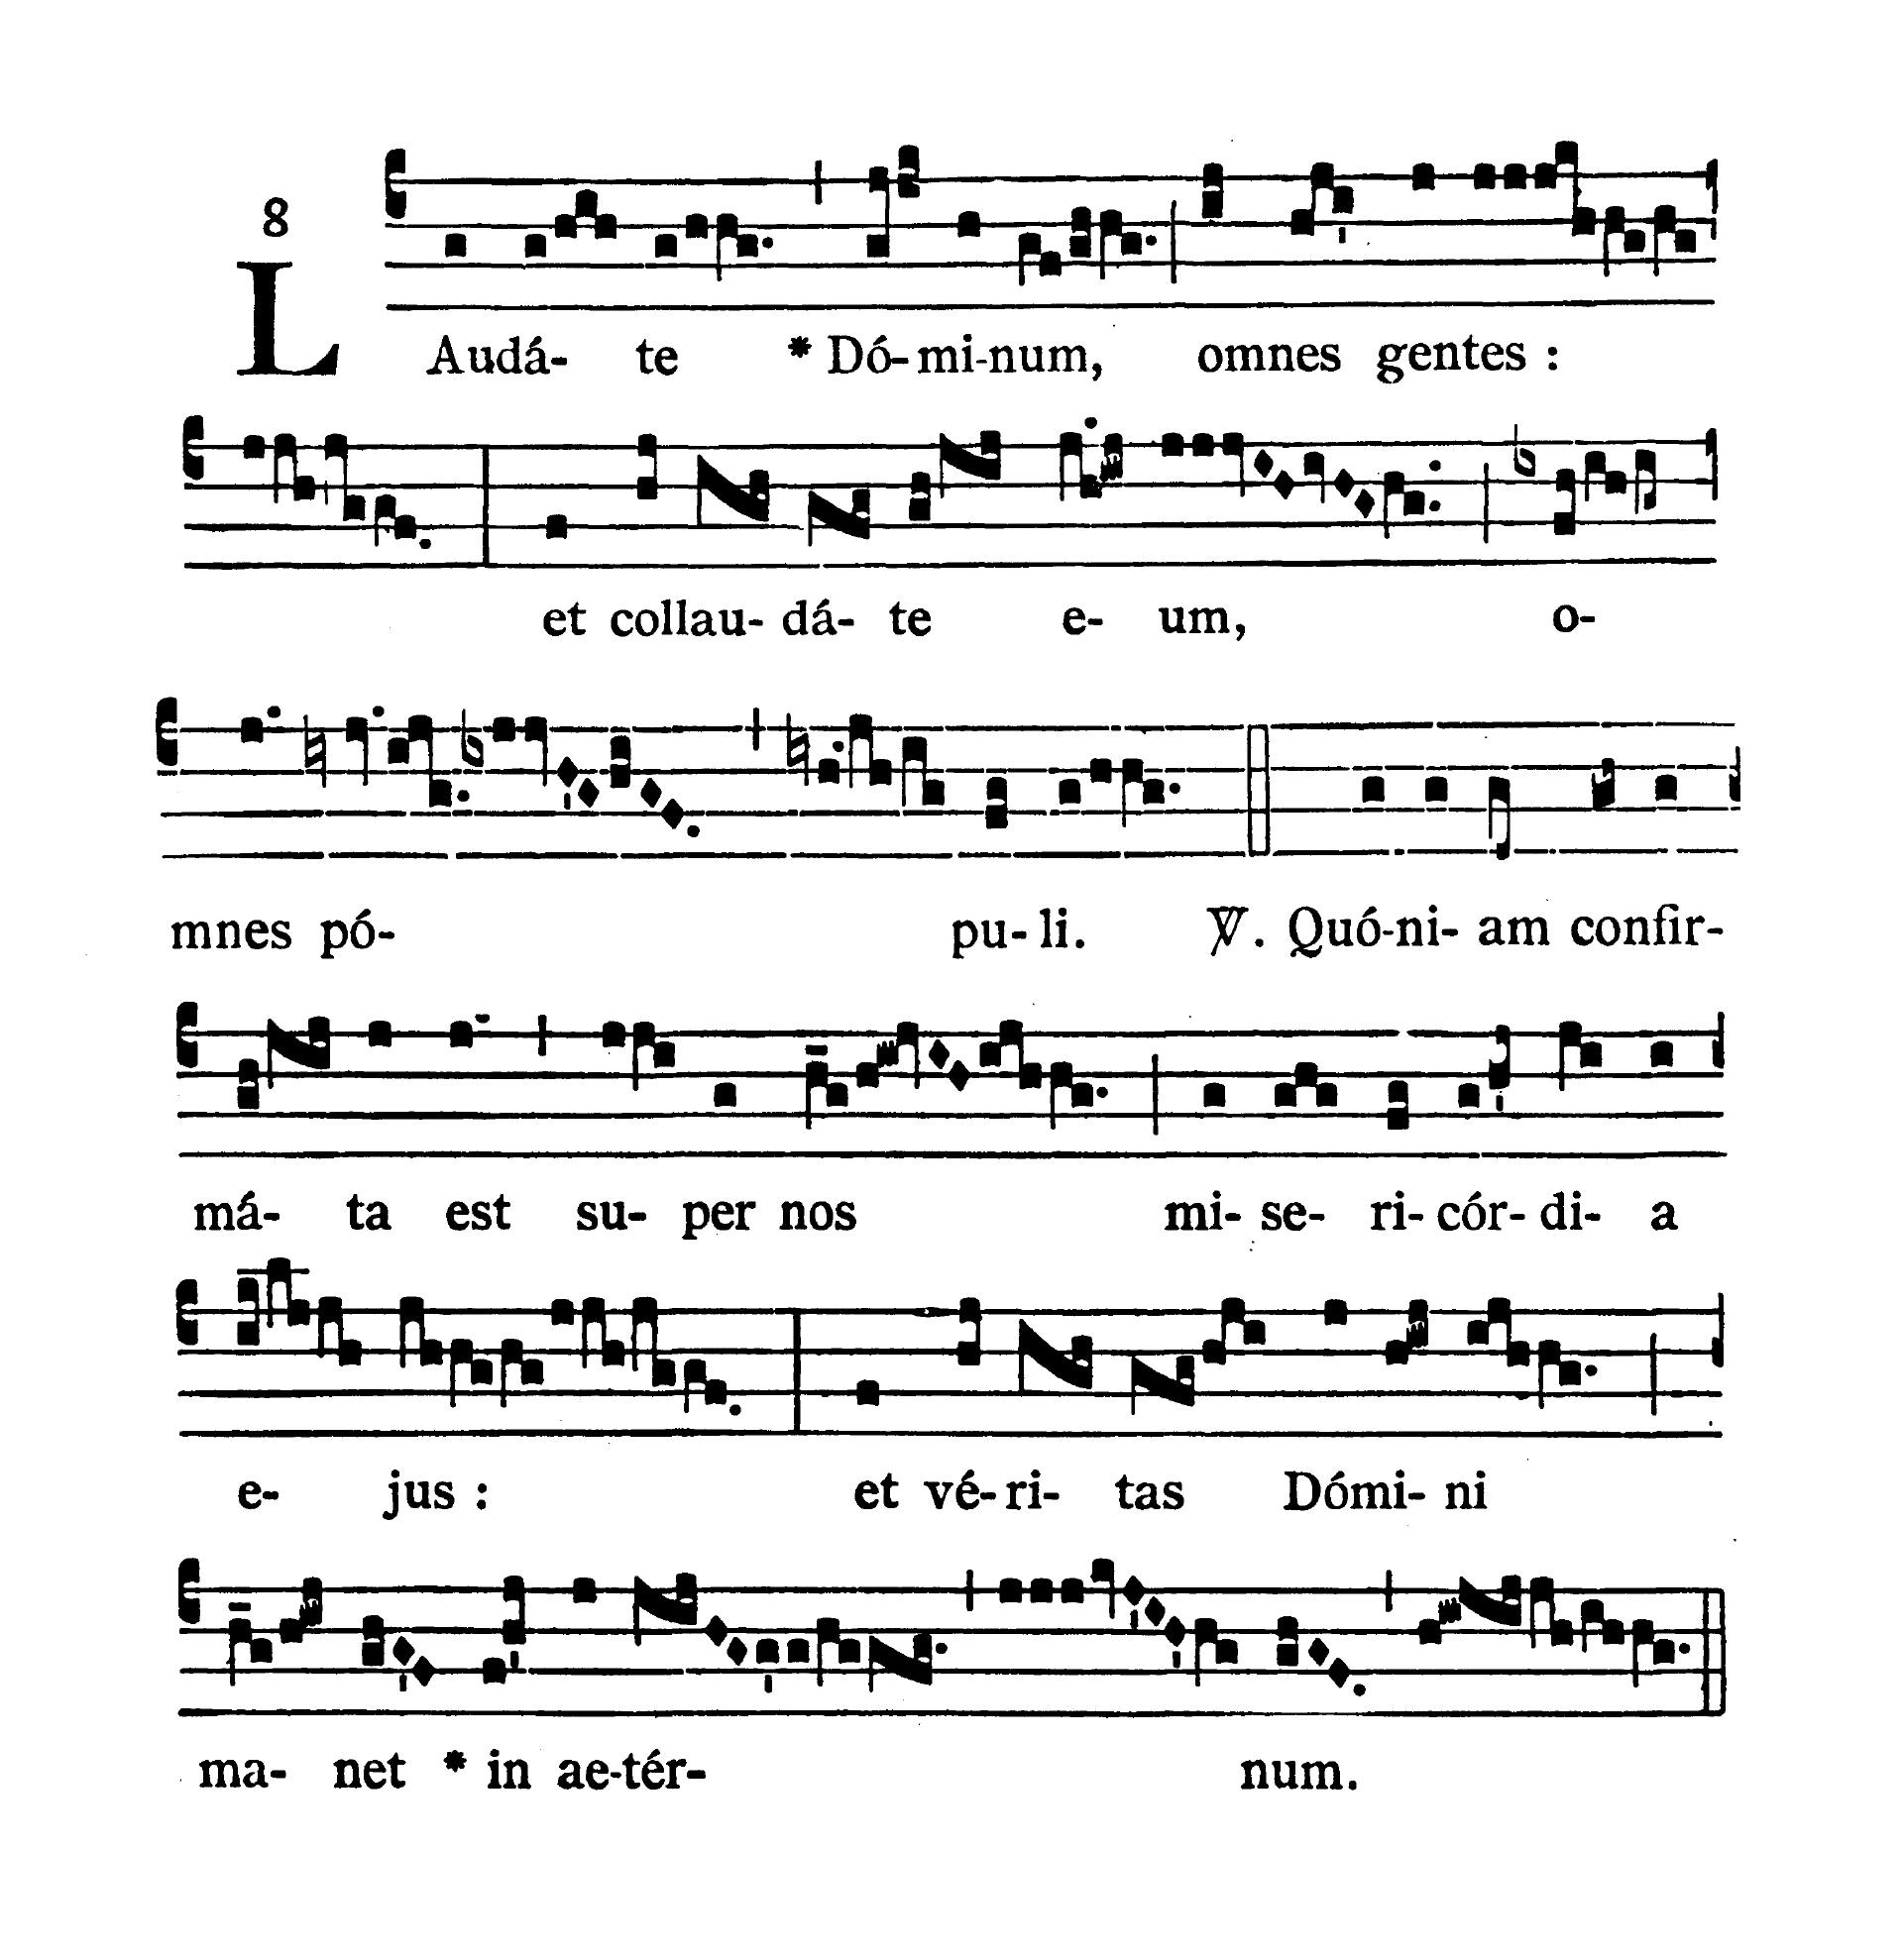 In Vigilia Pentecostes (Wigilia Zesłania Ducha Świętego) - Tractus (Laudate Dominum)